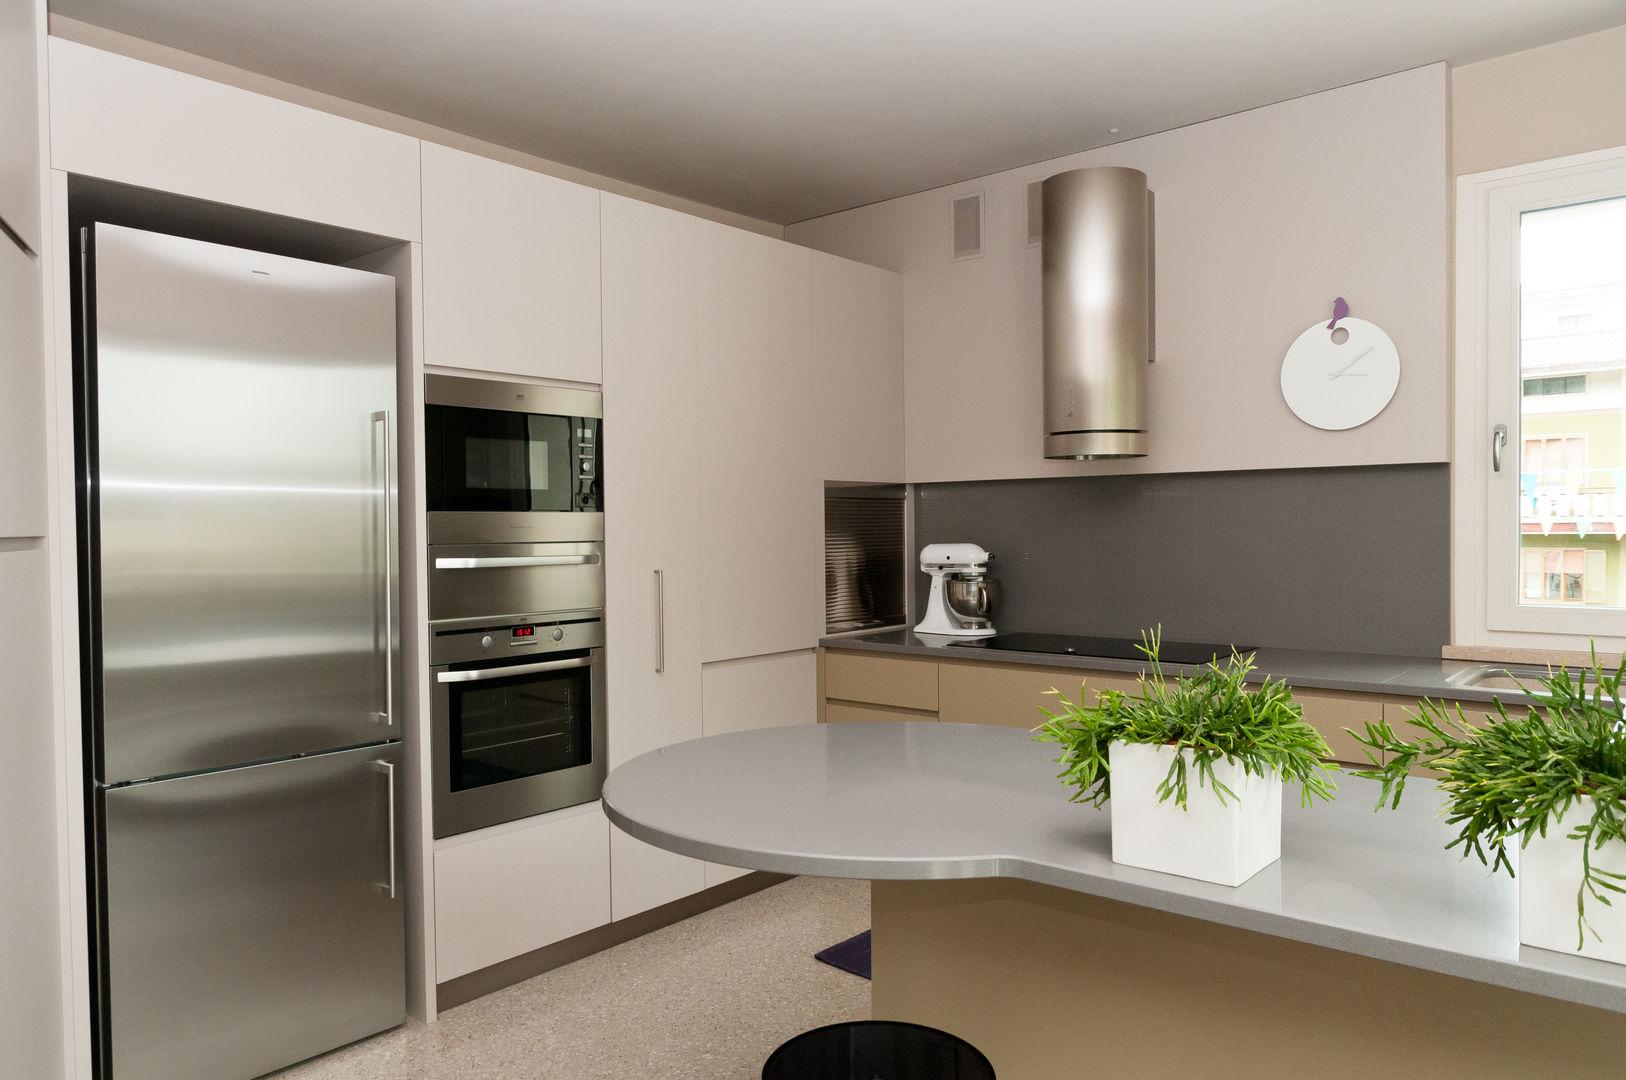 Top 10 cucine piccole per ogni tipo di esigenza for Arredatore ikea